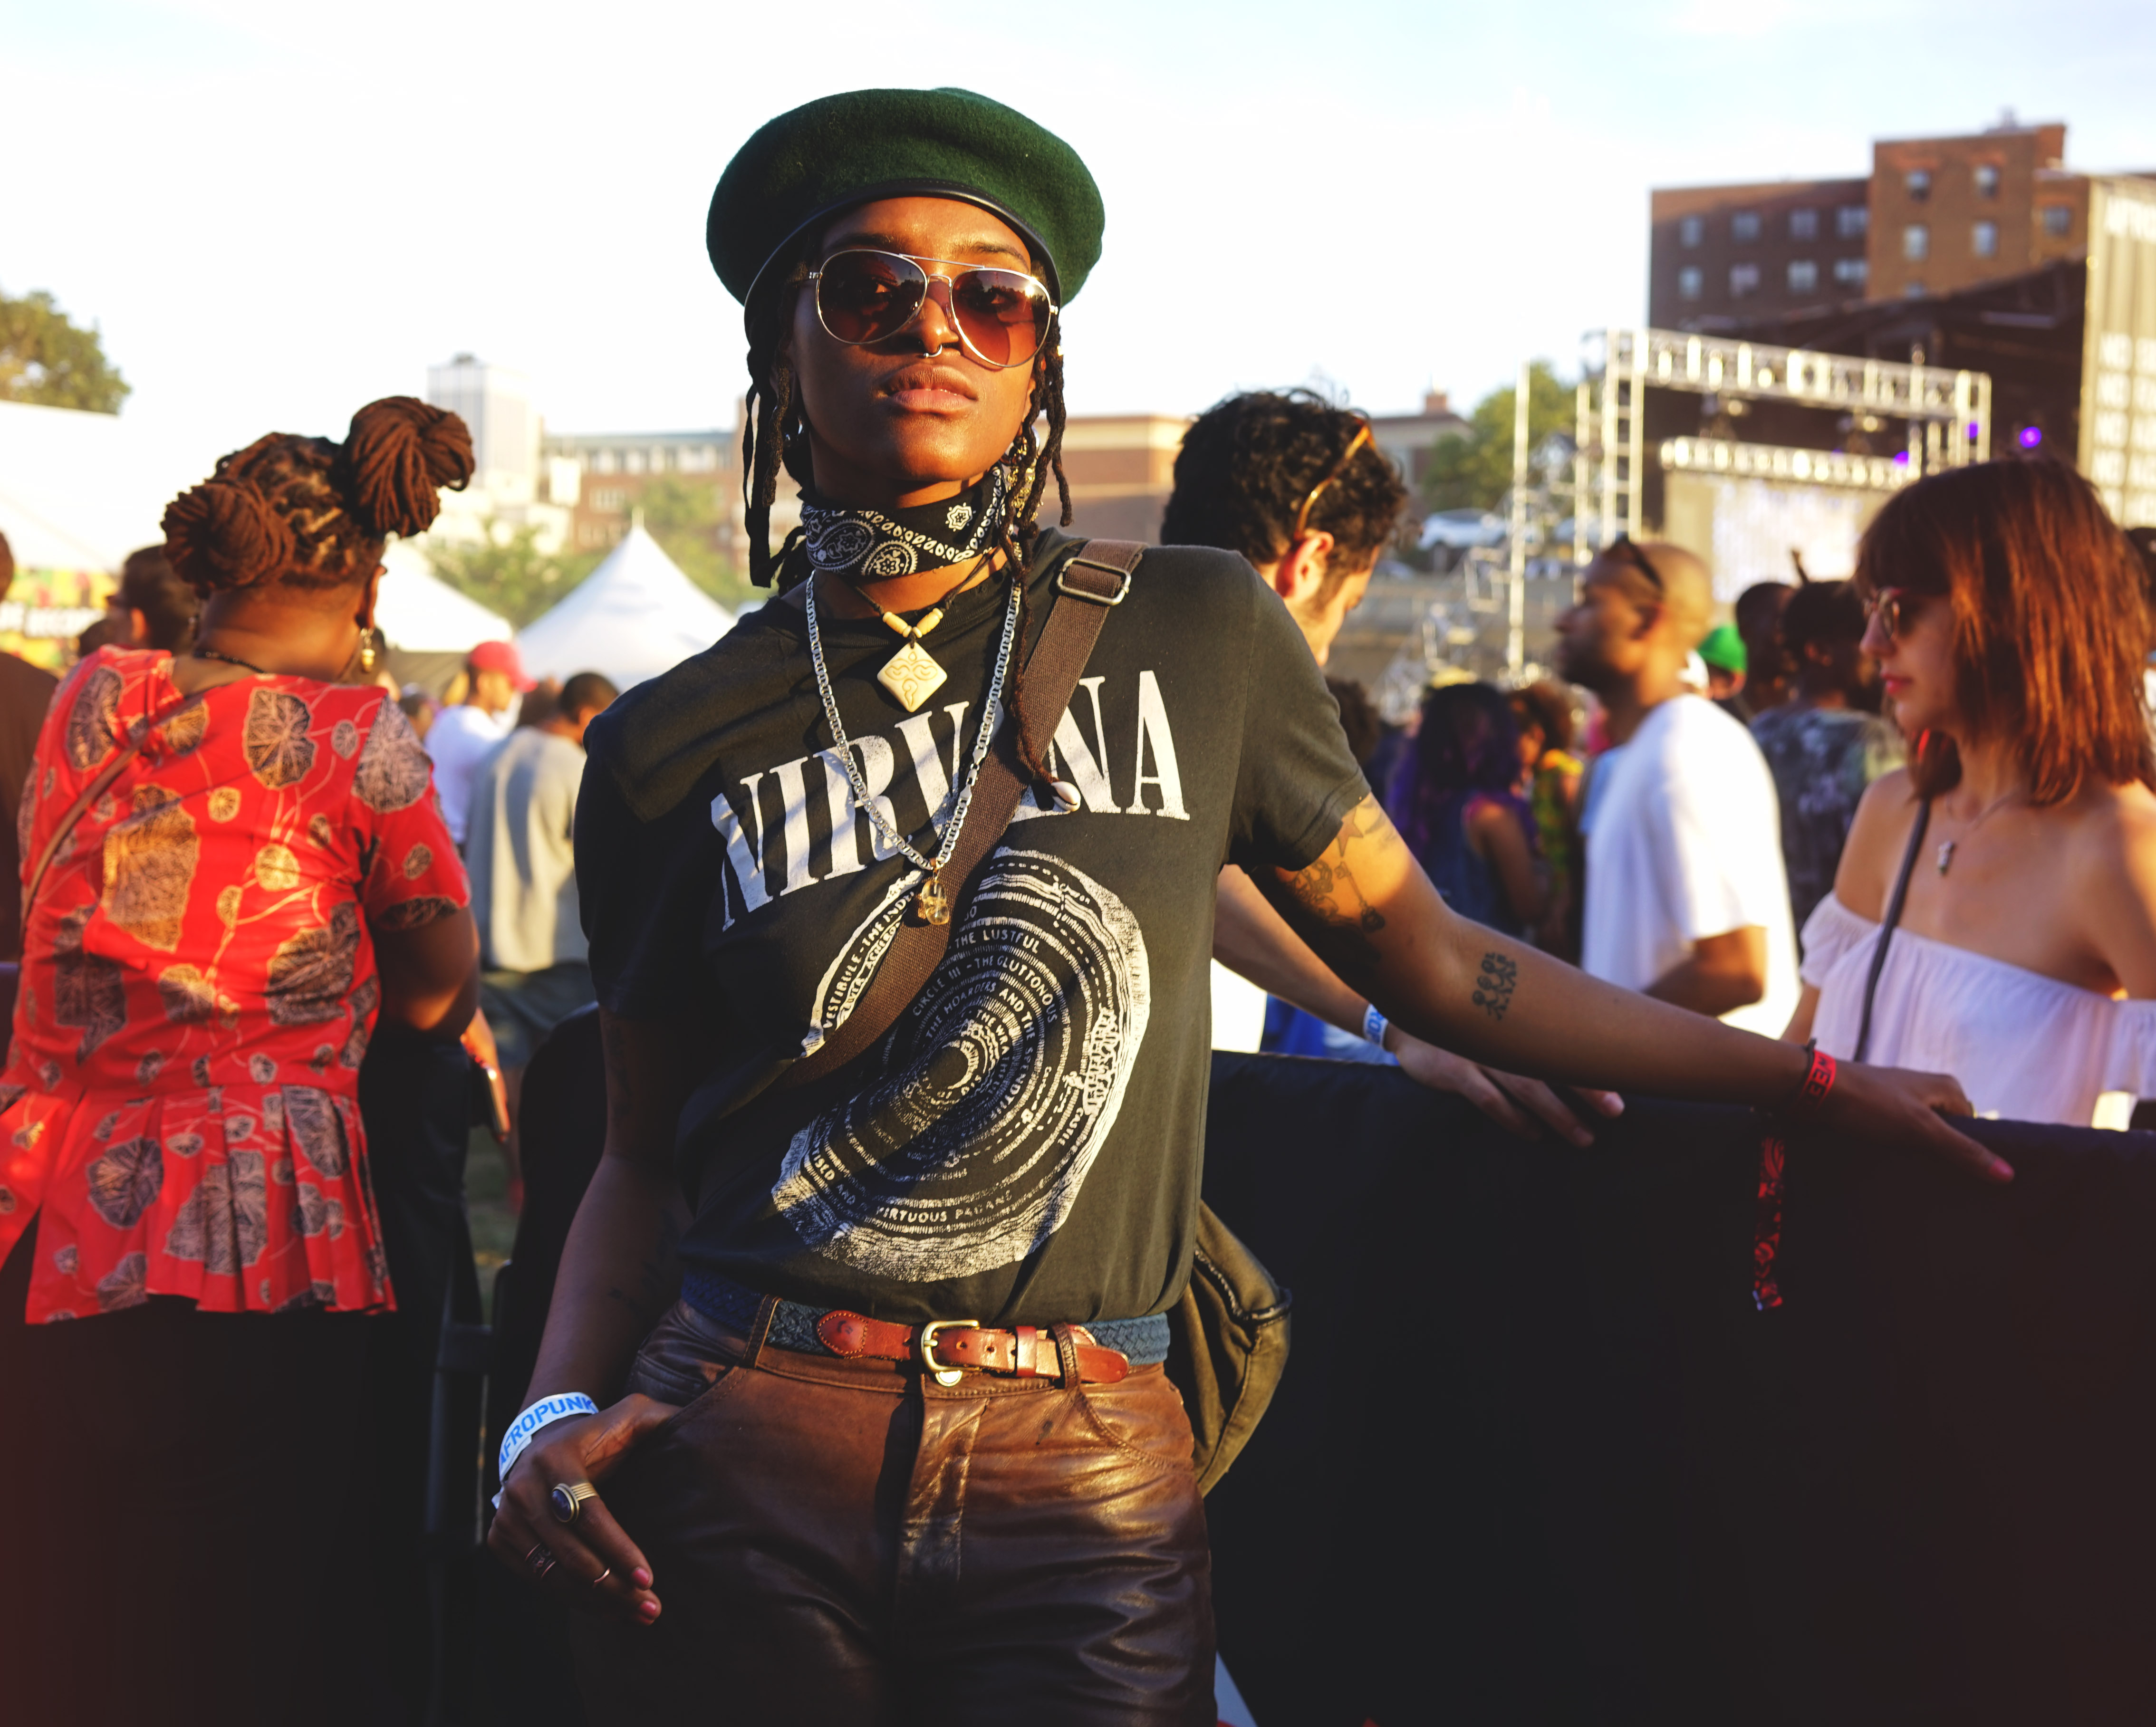 Bukunmigrace_AfroPunk_Highsnobiety Nirvana